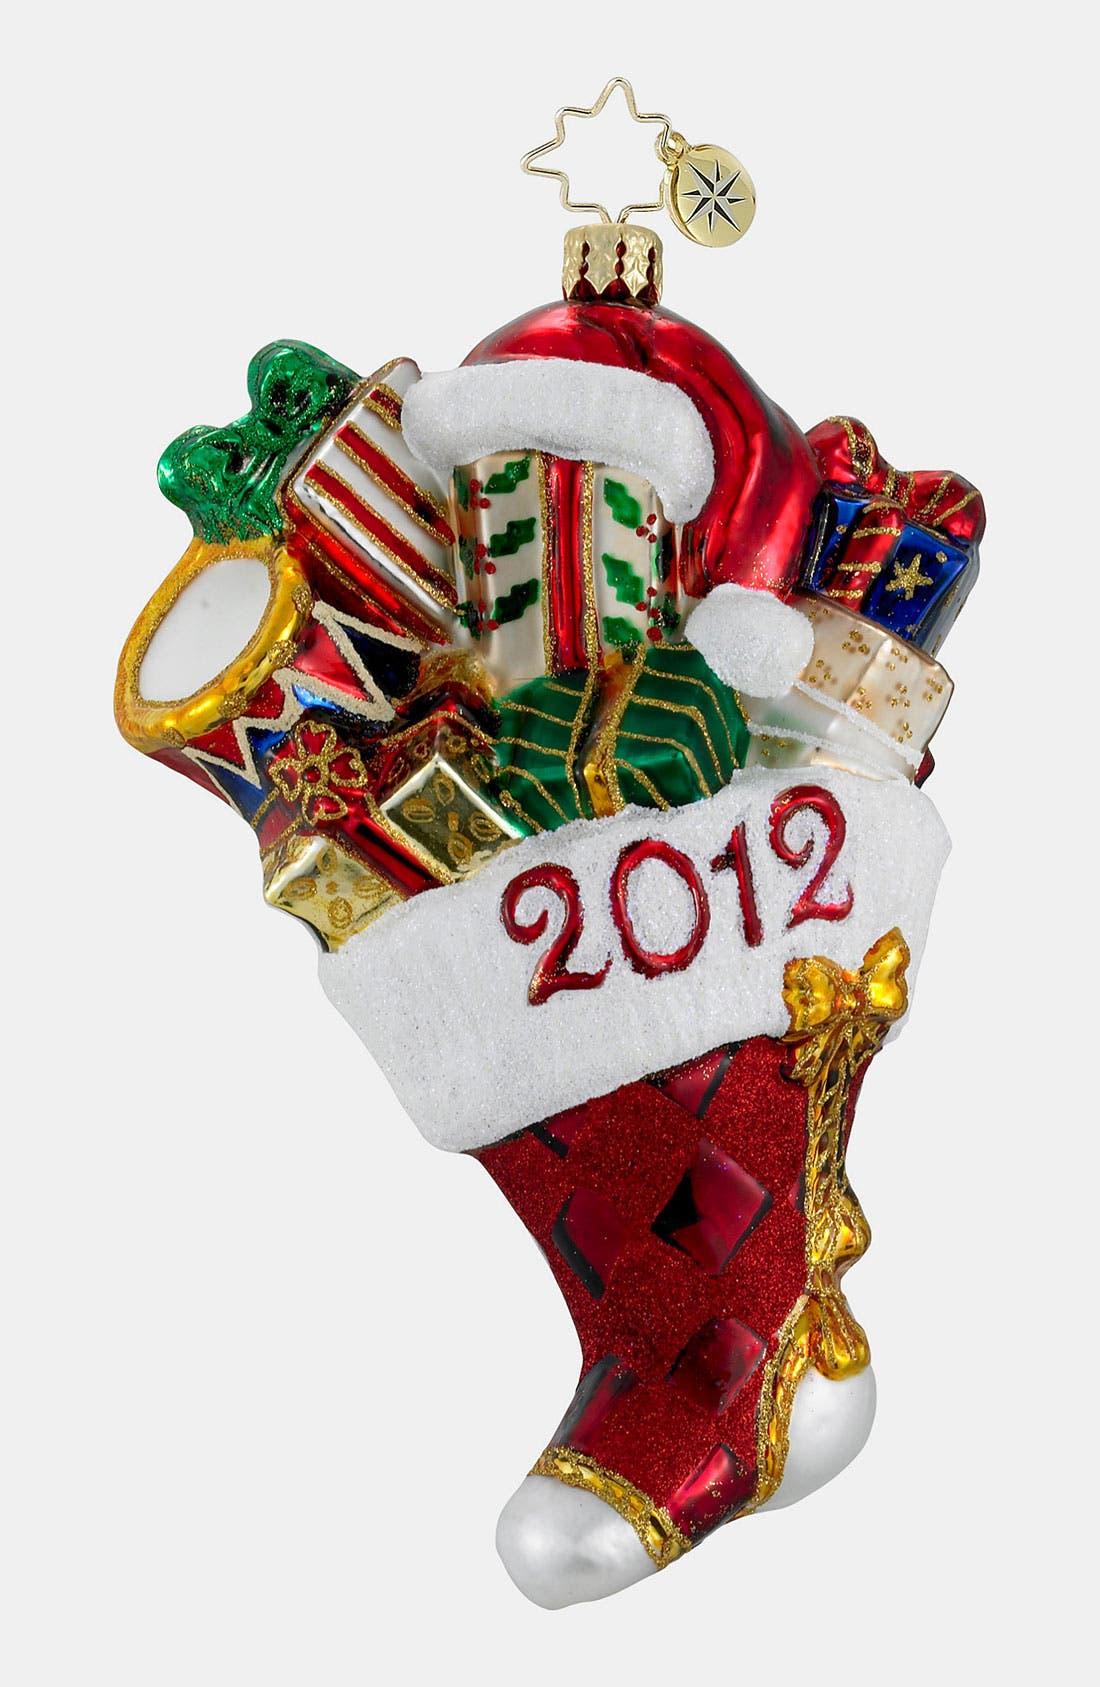 Alternate Image 1 Selected - Christopher Radko 'Presents-a-Plenty' Ornament